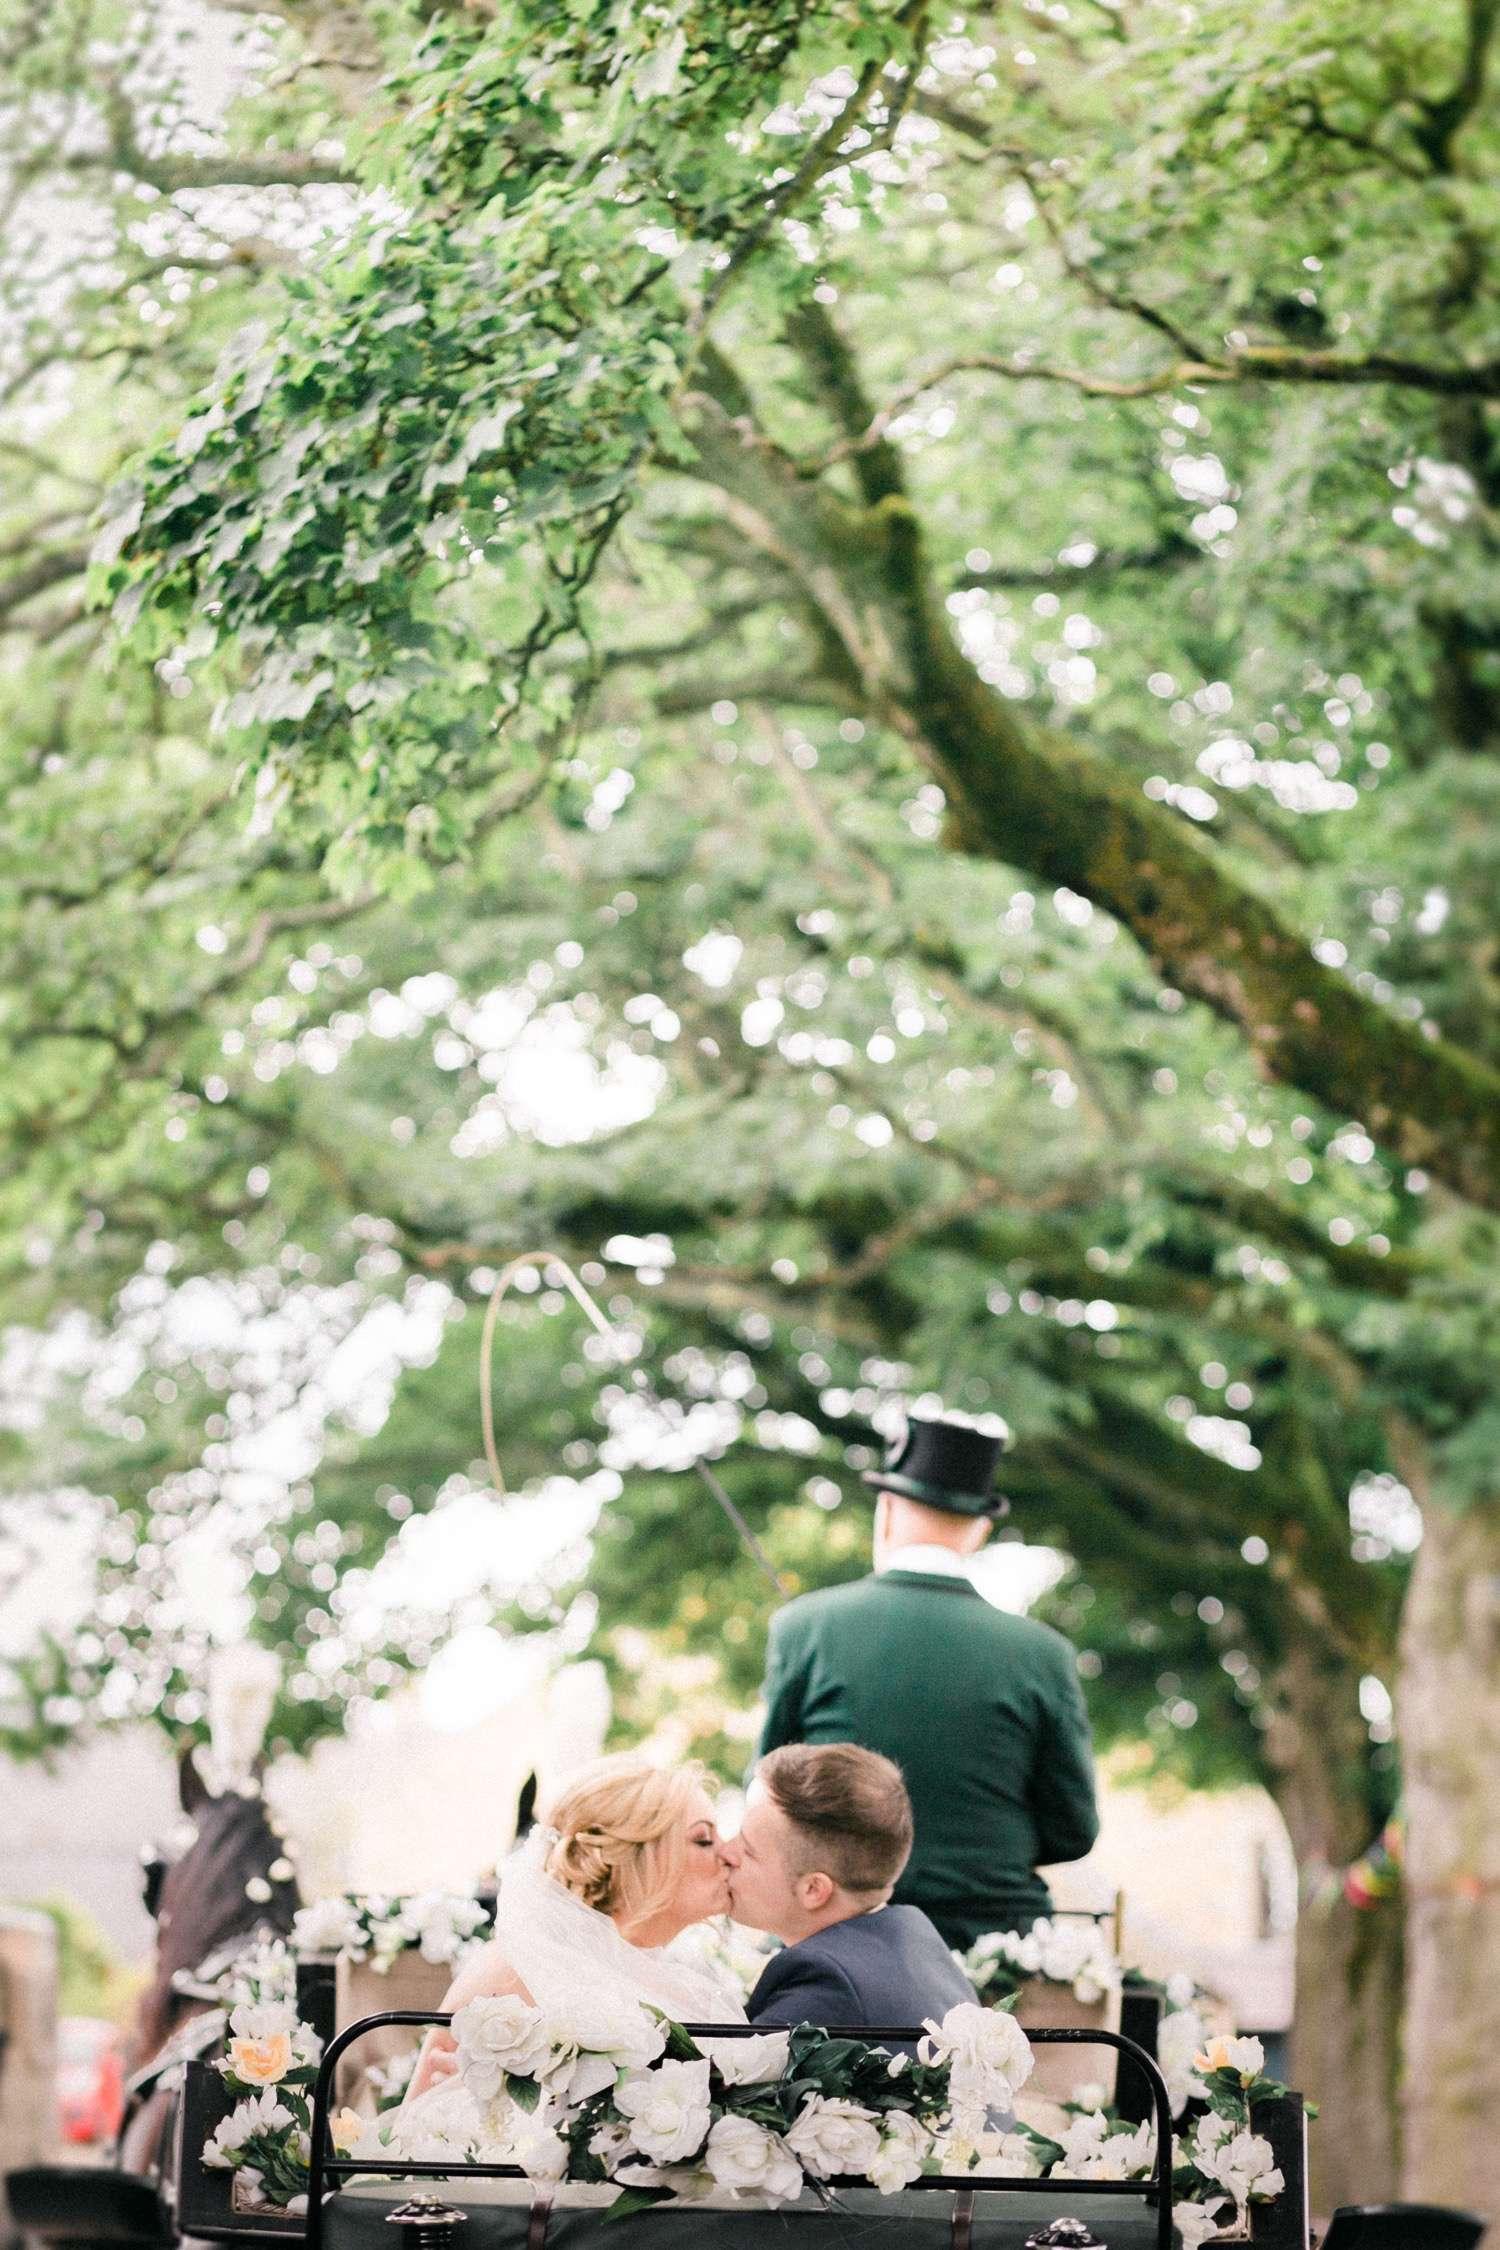 Stylish-Wedding-Photographer-Paul-Liddement-Wedding-Stories-25.jpg